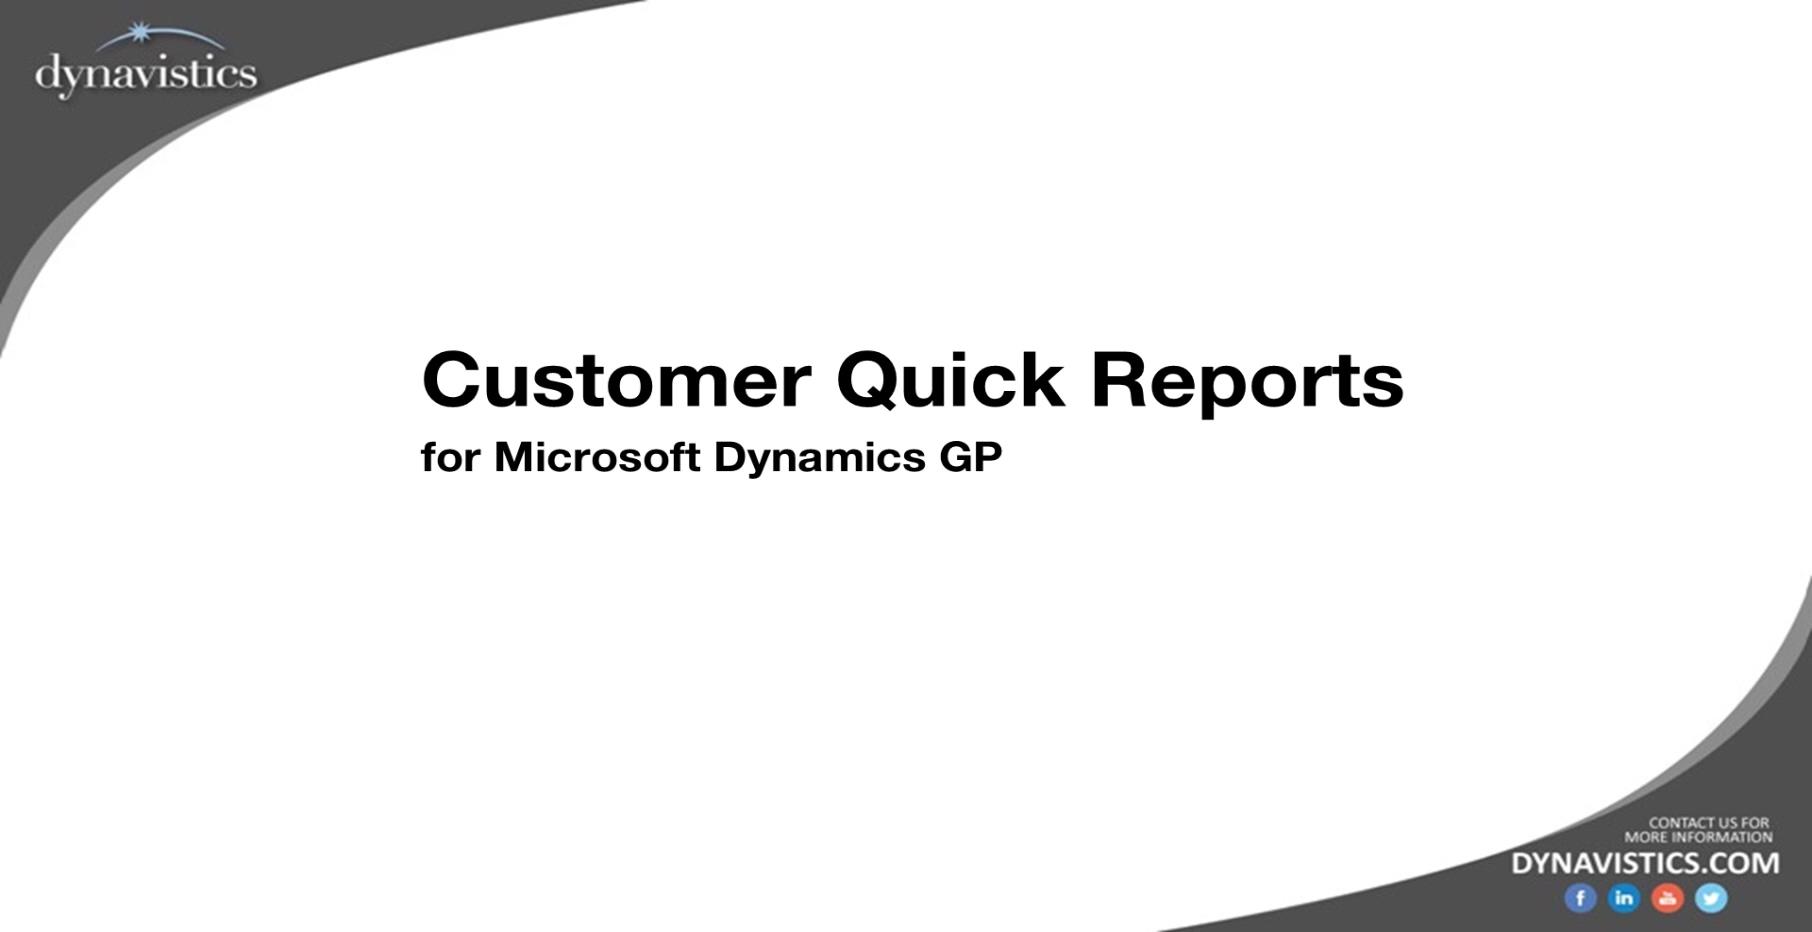 CustomerQuickReport 2-23-2020